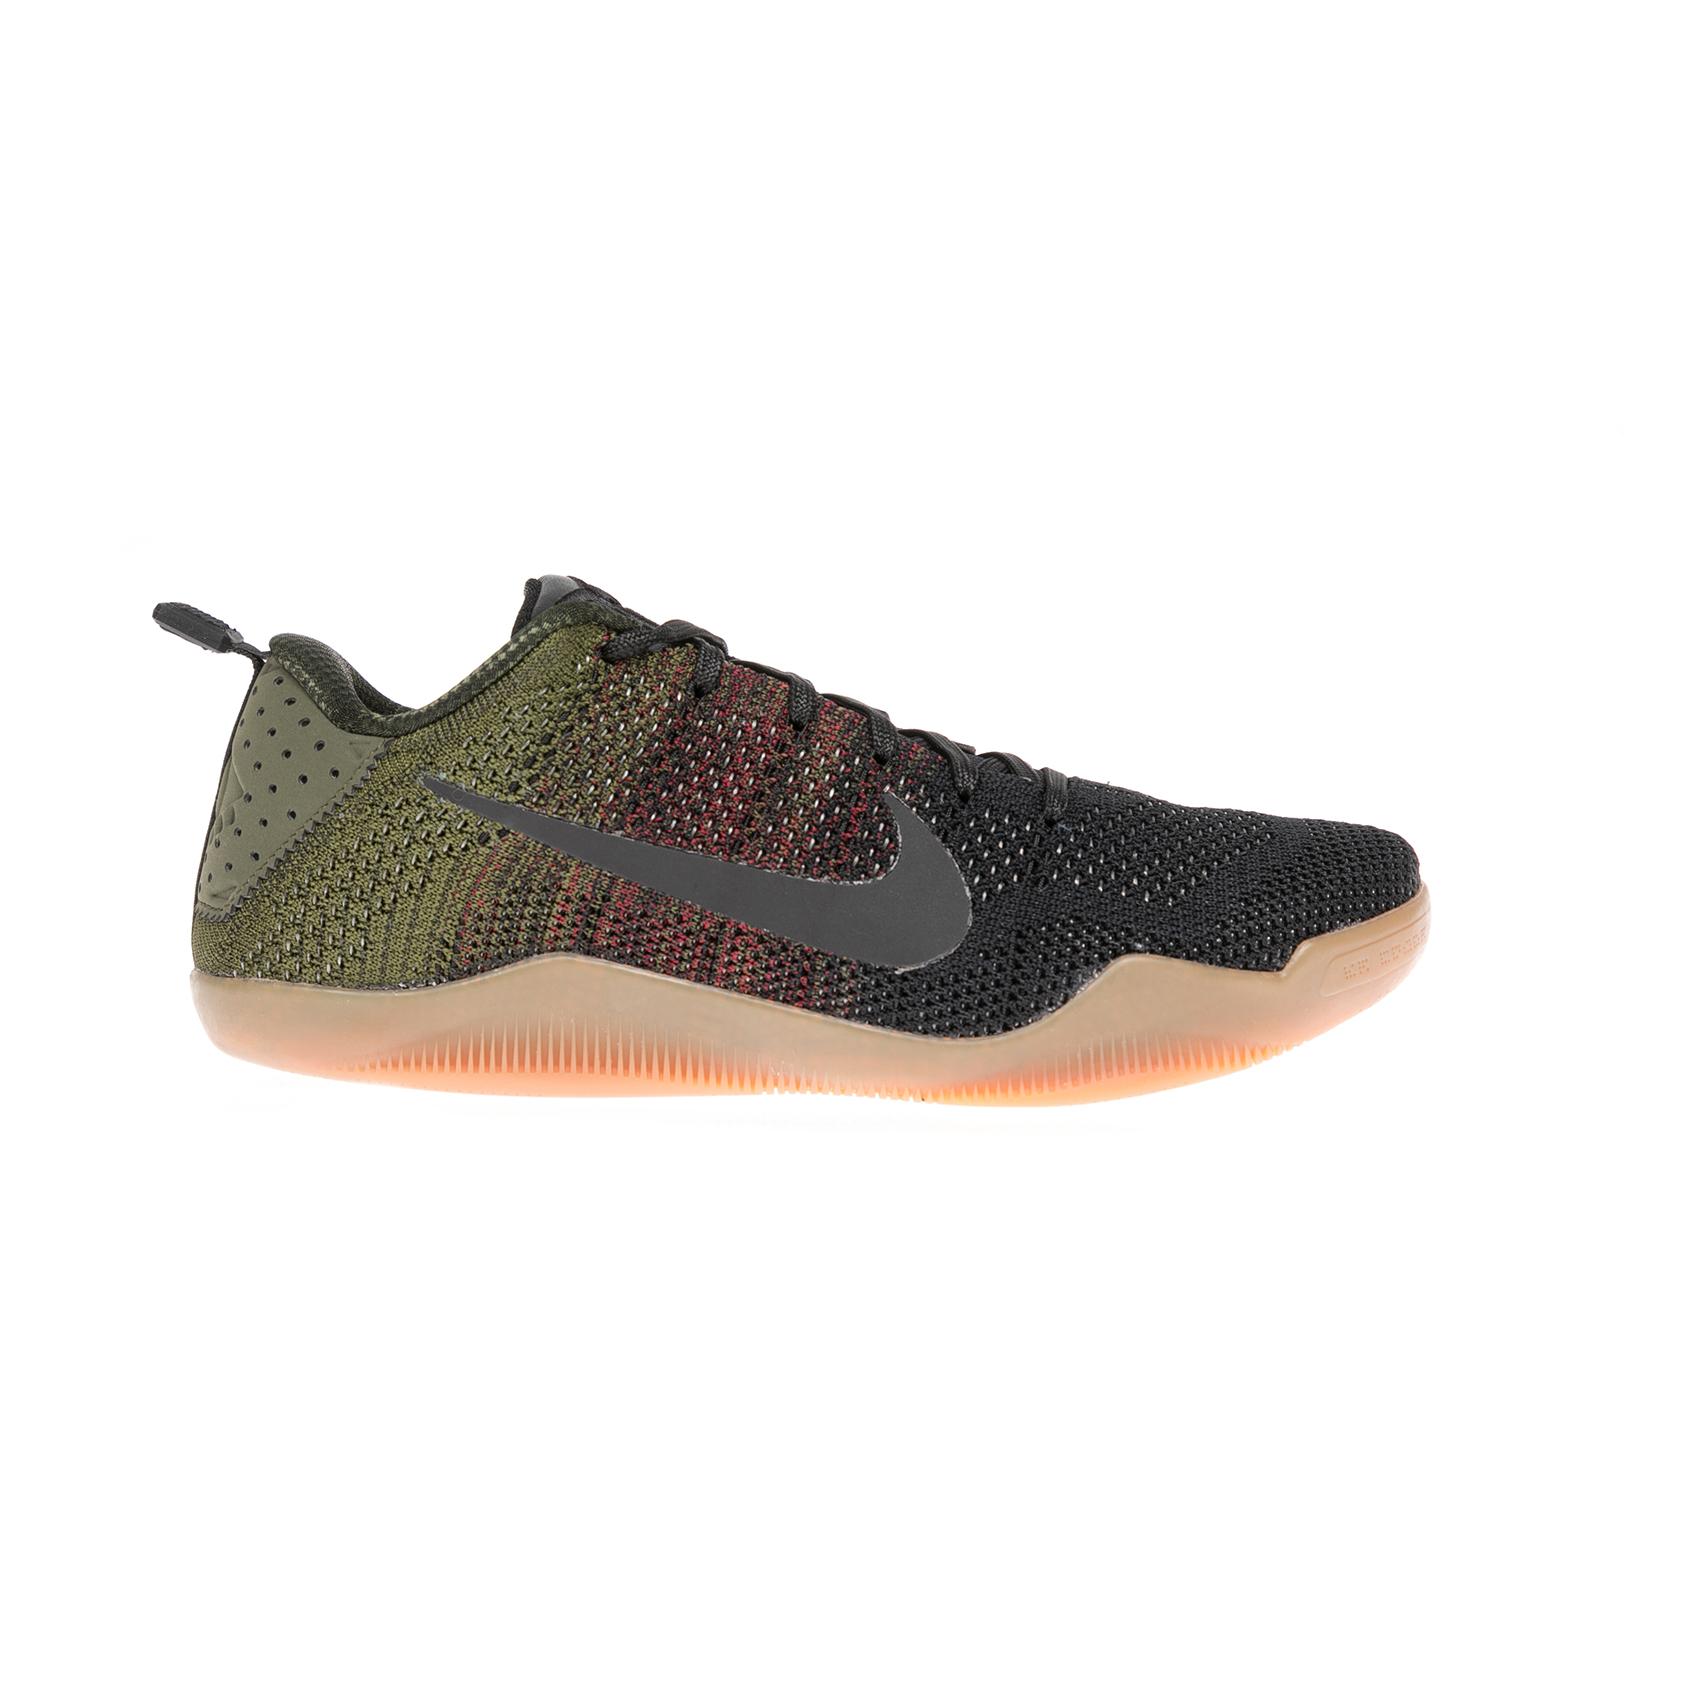 NIKE – Αντρικά παπούτσια NIKE KOBE XI ELITE LOW 4KB πολύχρωμα